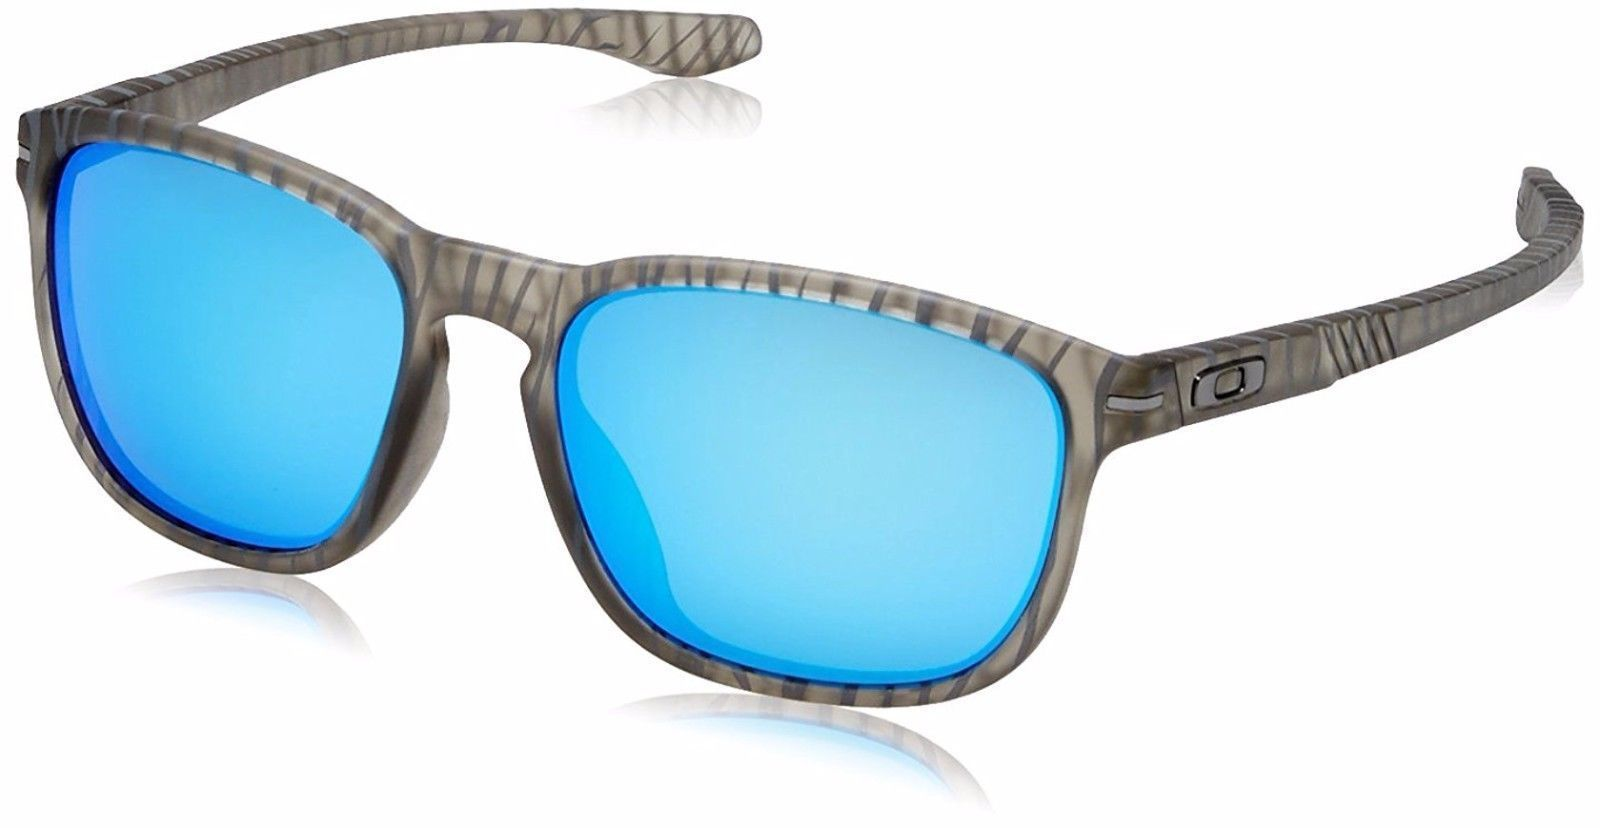 Oakley Enduro OO9274-07 Matte Gray Ink Sapphire Iridium Asian Fit Sunglasses  -  58.41 a79b9f59d39d